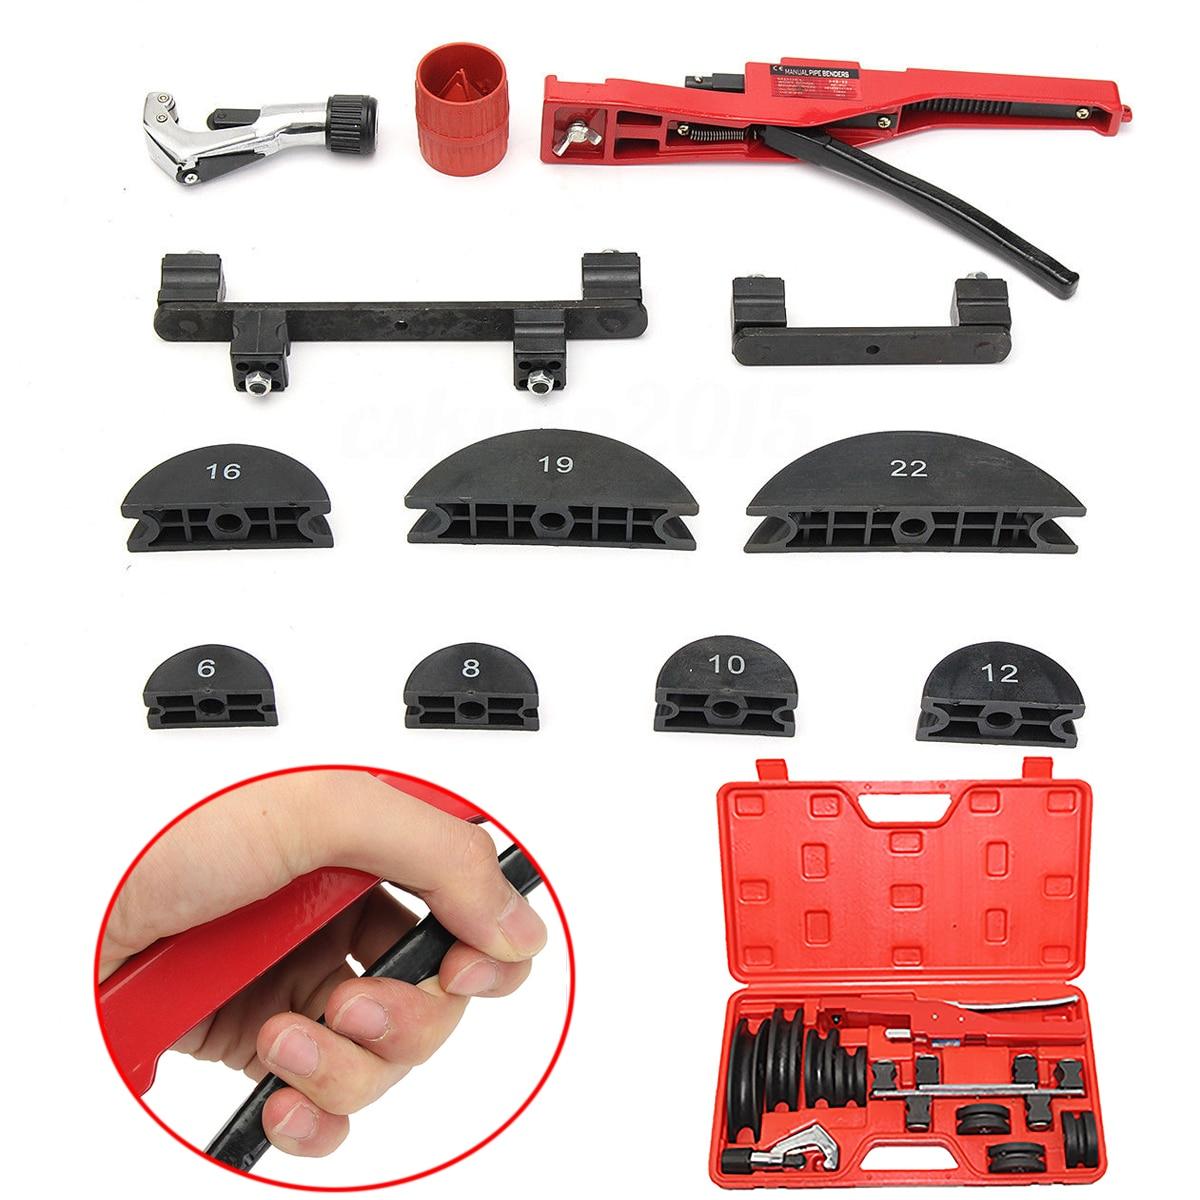 Mayitr Handheld Copper Pipe Bending Tool Kit Manual Steel Tubing Bender 6 8 10 12 16 19 22mm